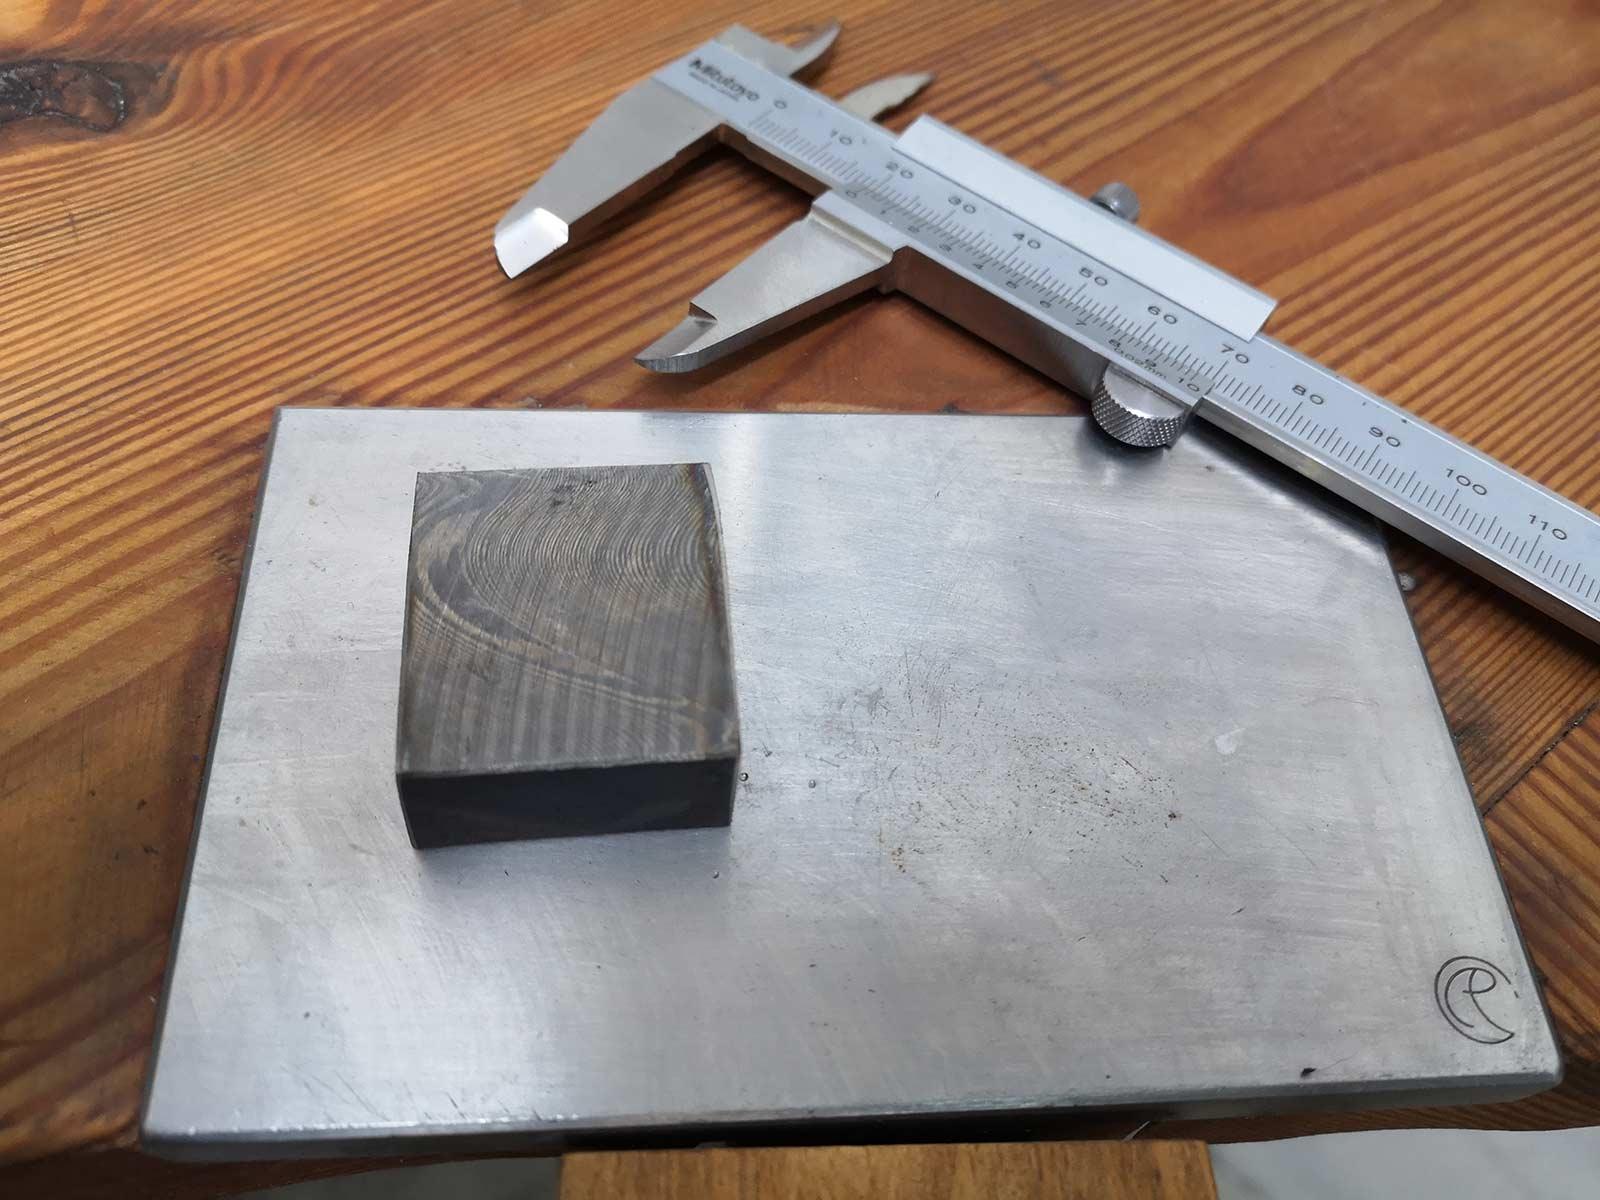 Metallblock auf Werkbank